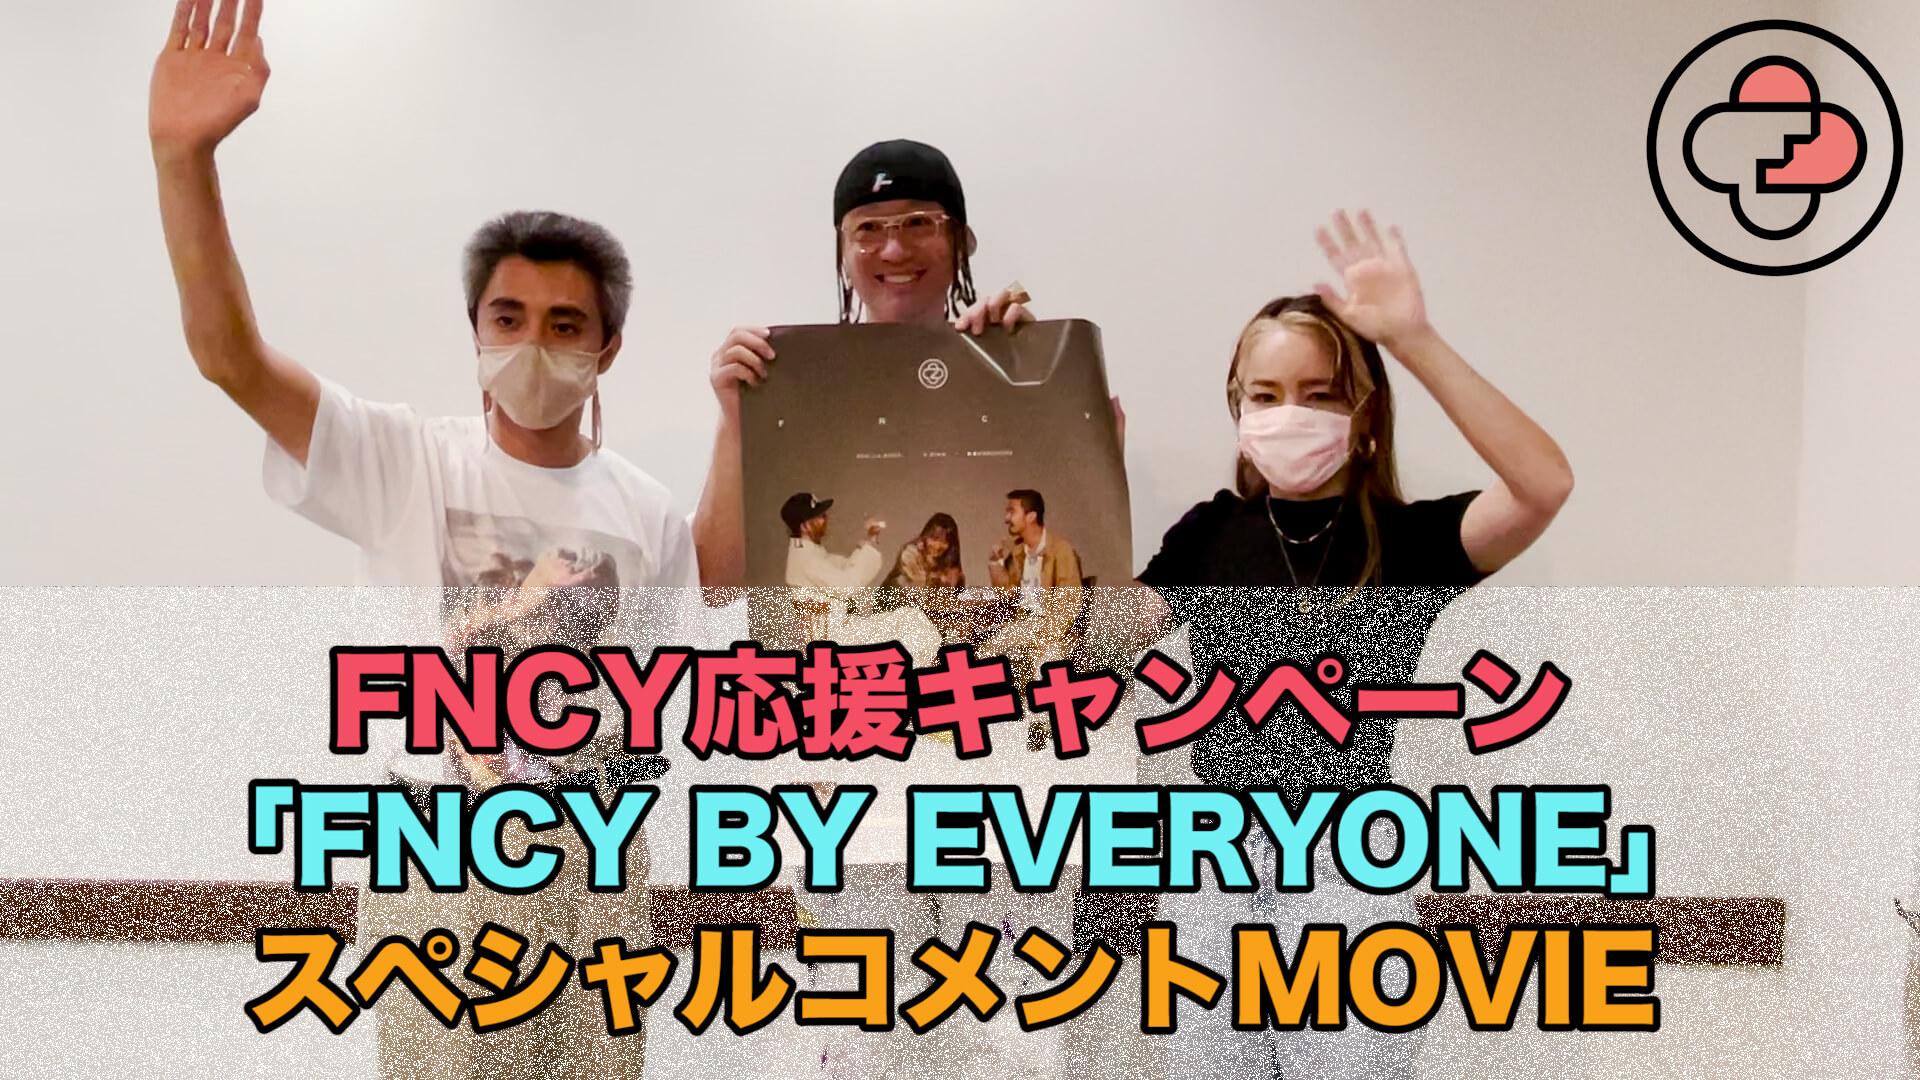 FNCYの2ndアルバムのタイトルが『FNCY BY FNCY』に決定!ジャケットアートも解禁&豪華特典も発表 music210806_fncy_2